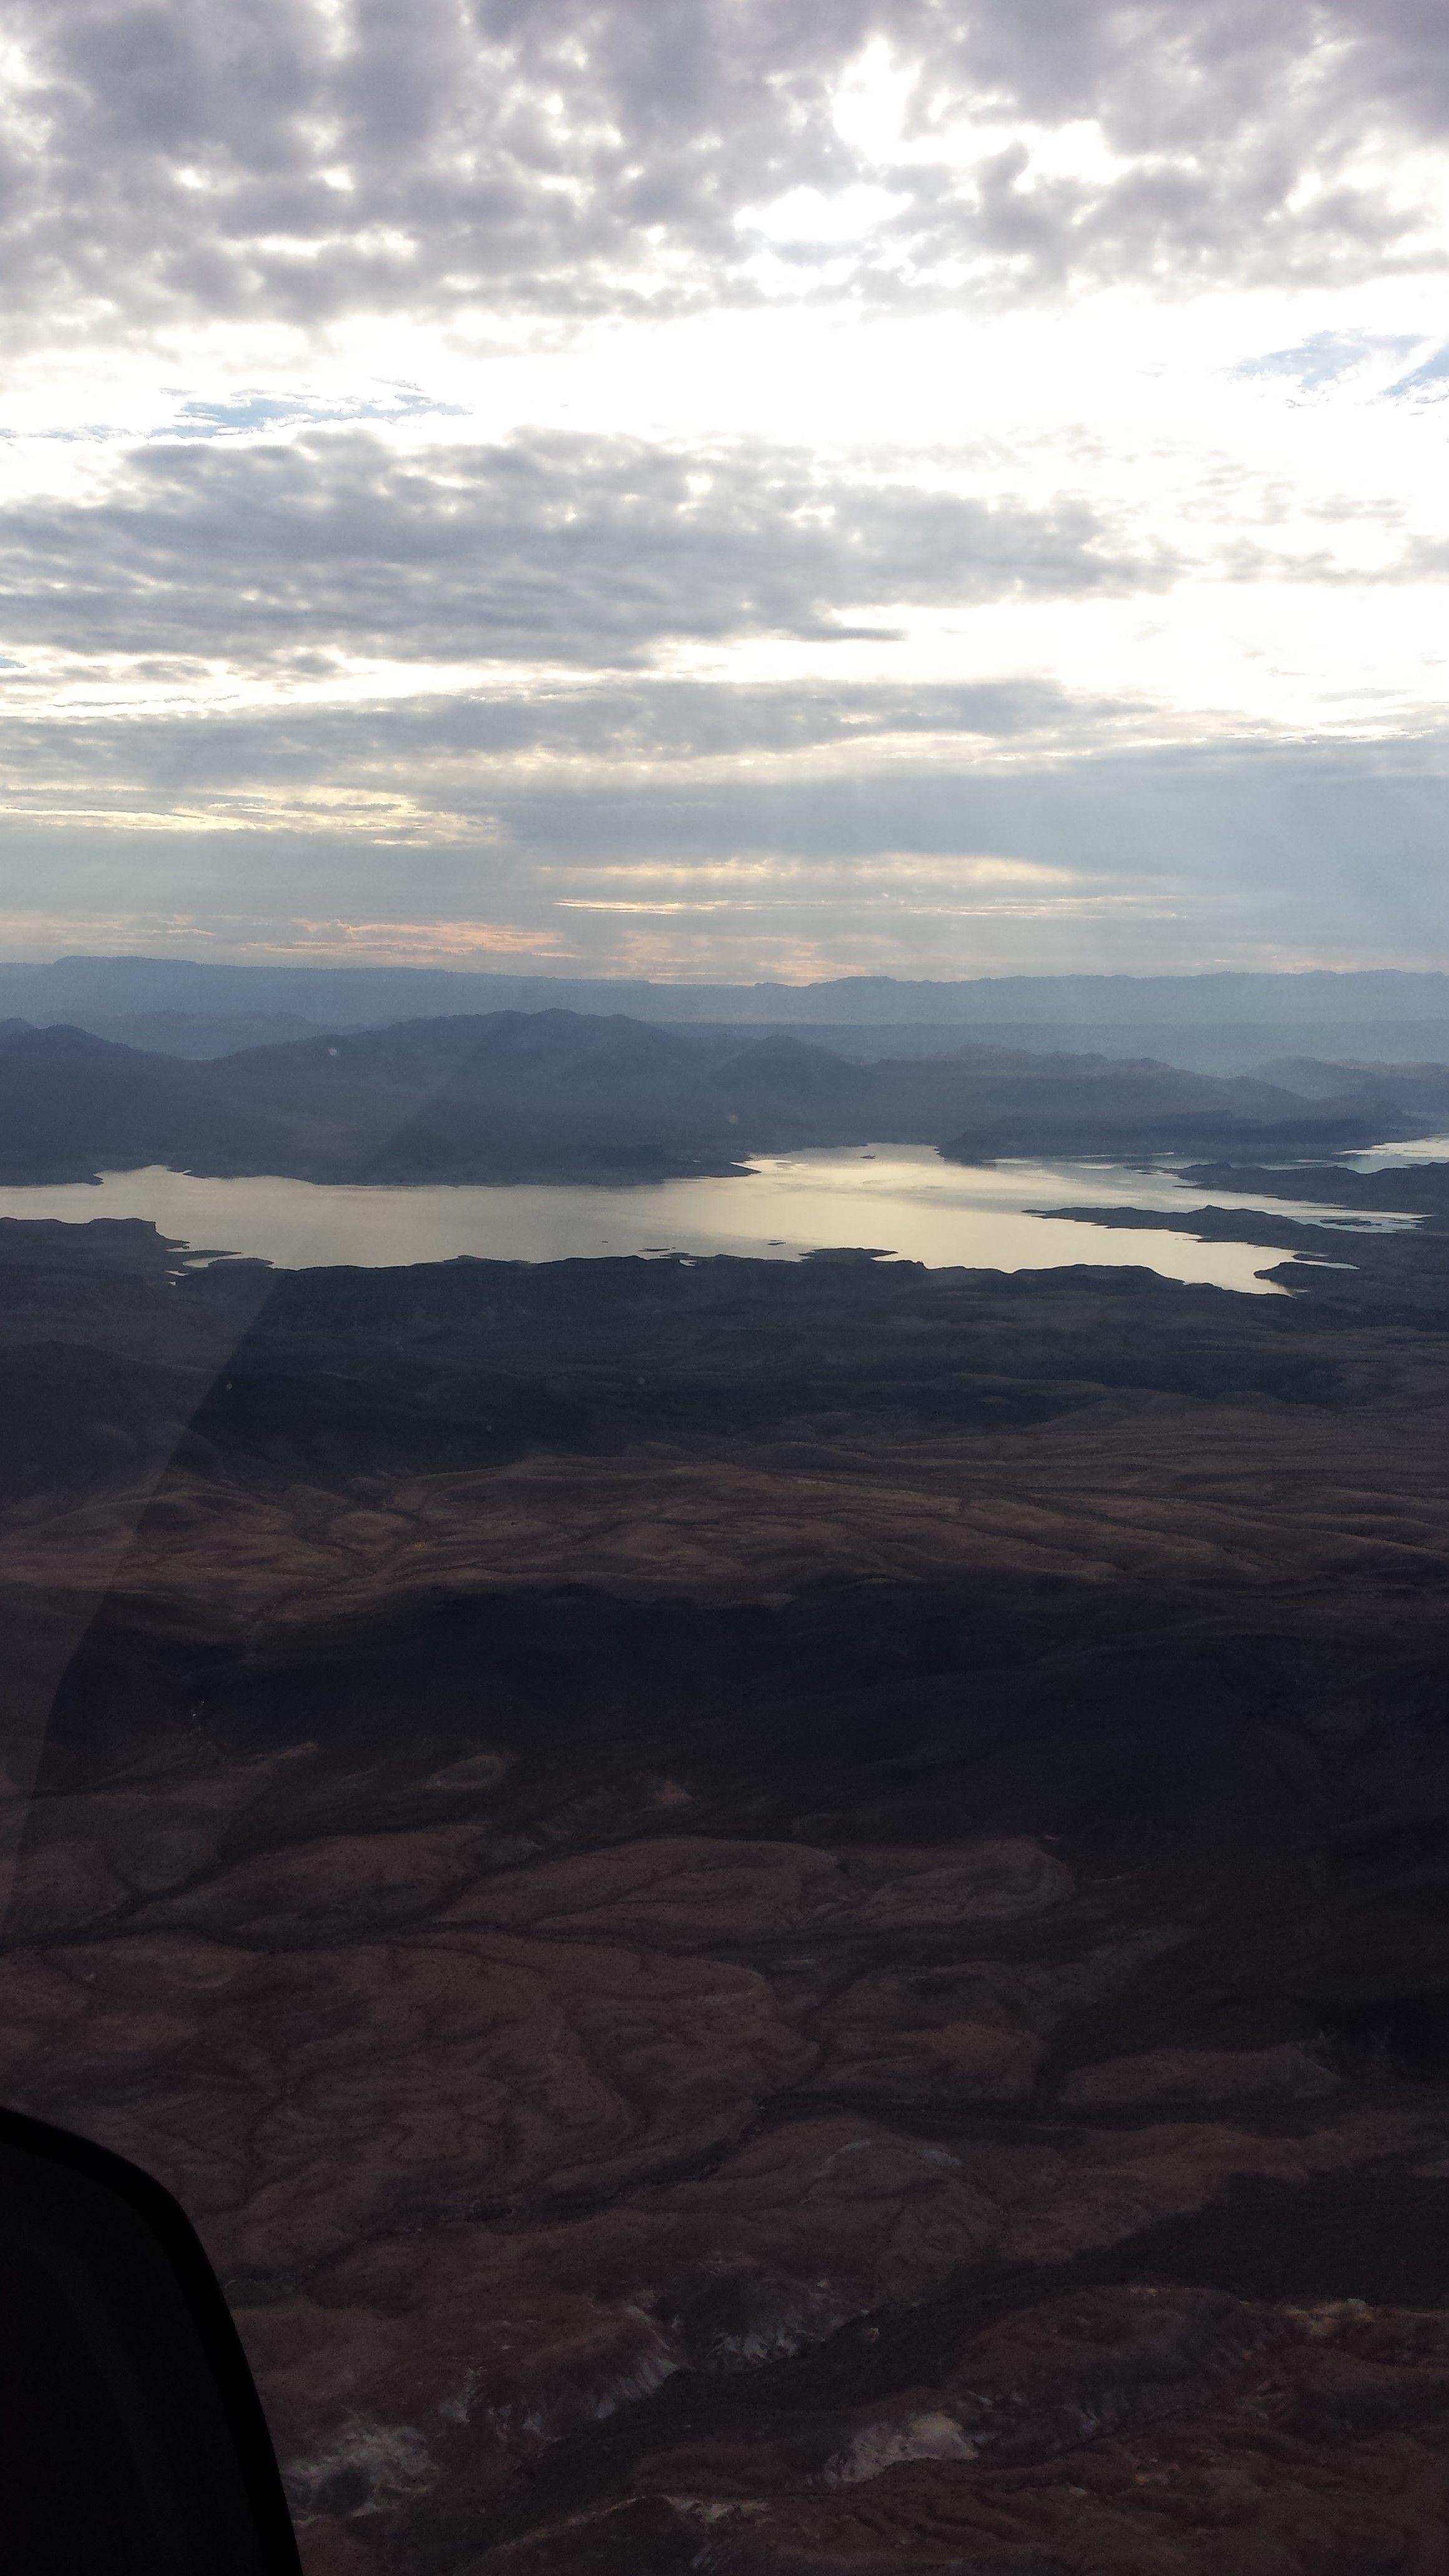 Lake mead lake mead airplane view las vegas